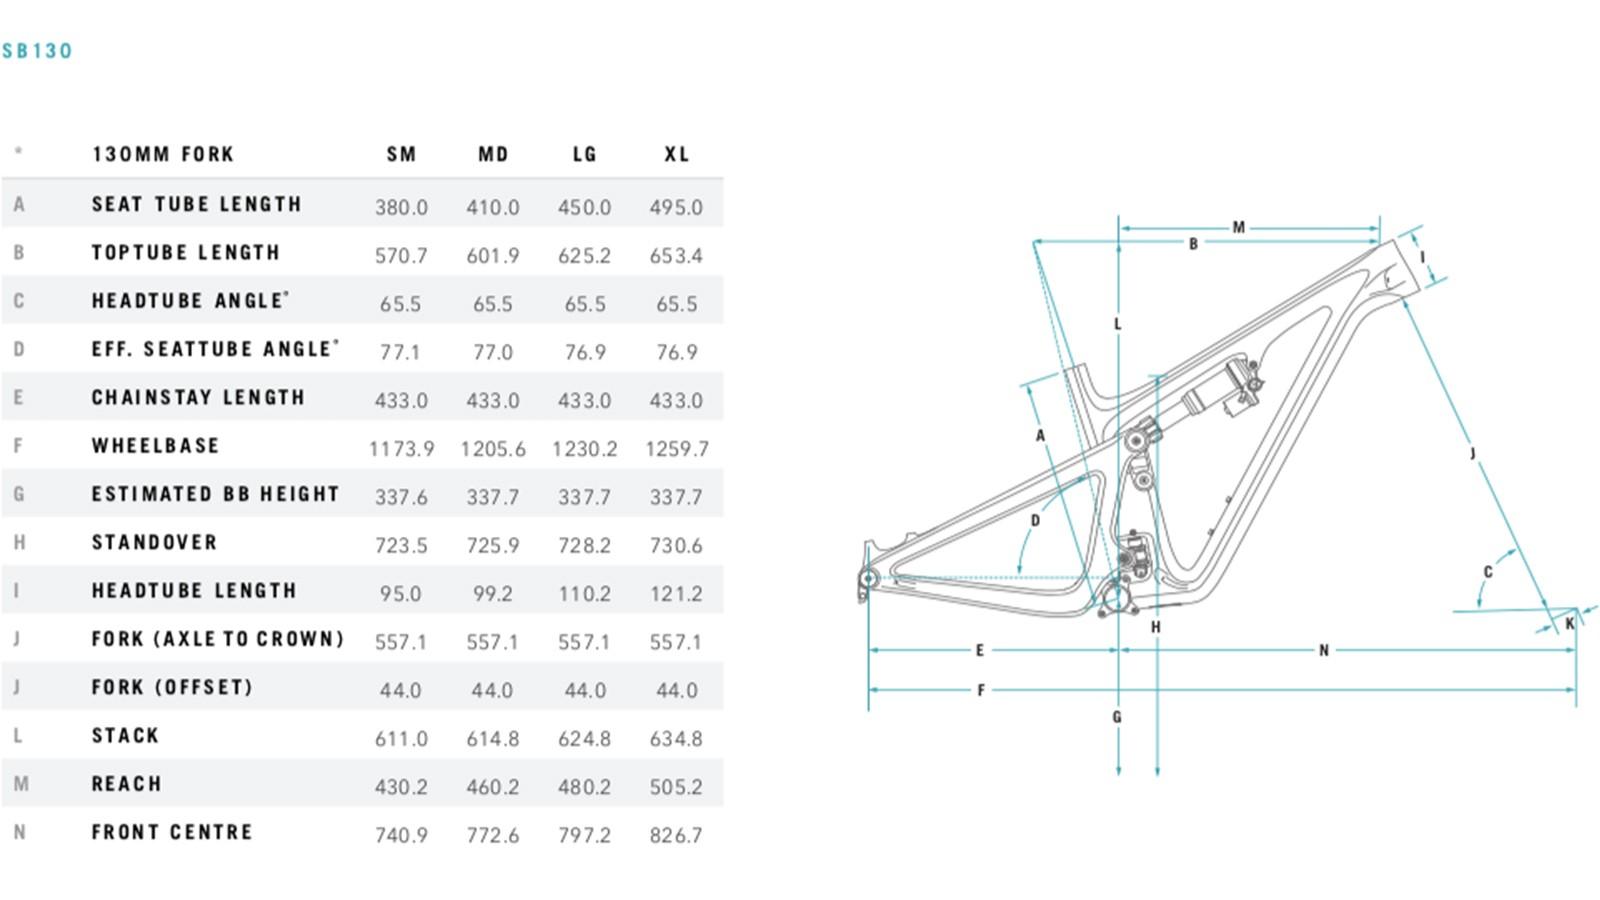 The SB130 is longer and slacker than many longer-travel enduro bikes